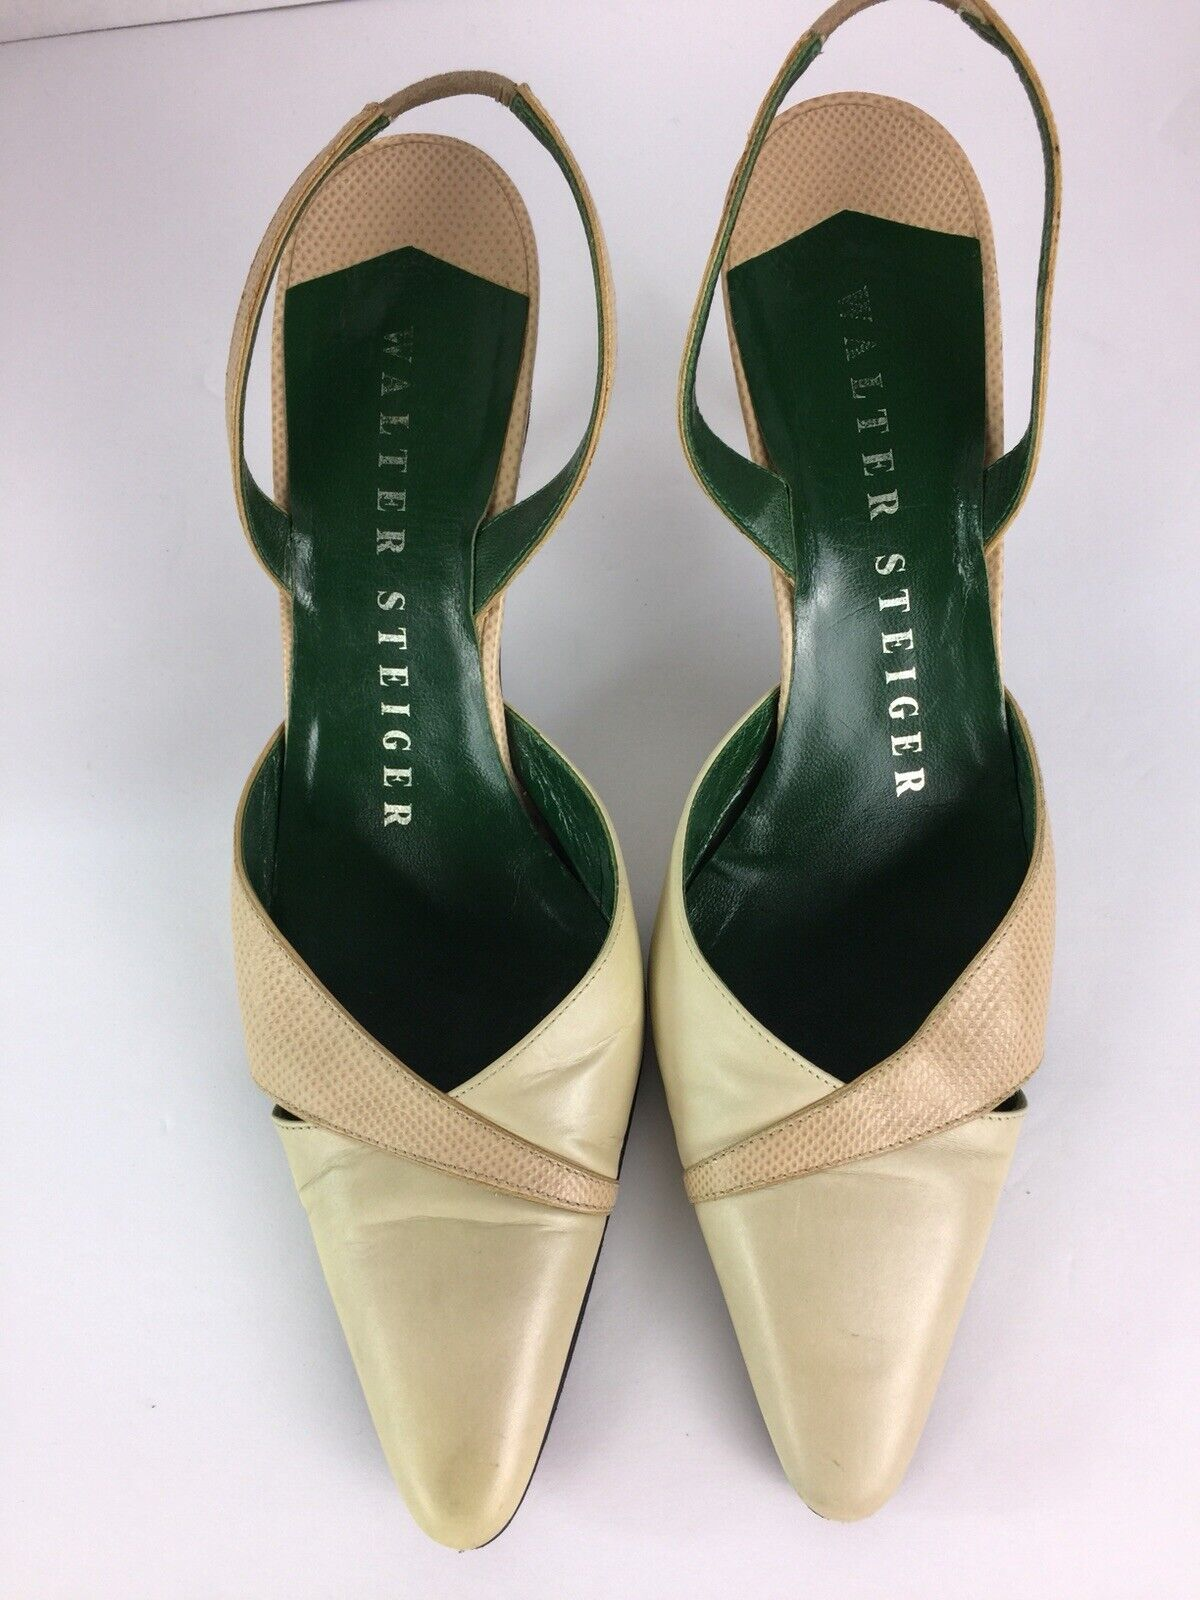 design semplice e generoso Walter Steiger Steiger Steiger donna scarpe Dimensione 7.5 oro Metallic Leather Ankle Strap Heels  punti vendita